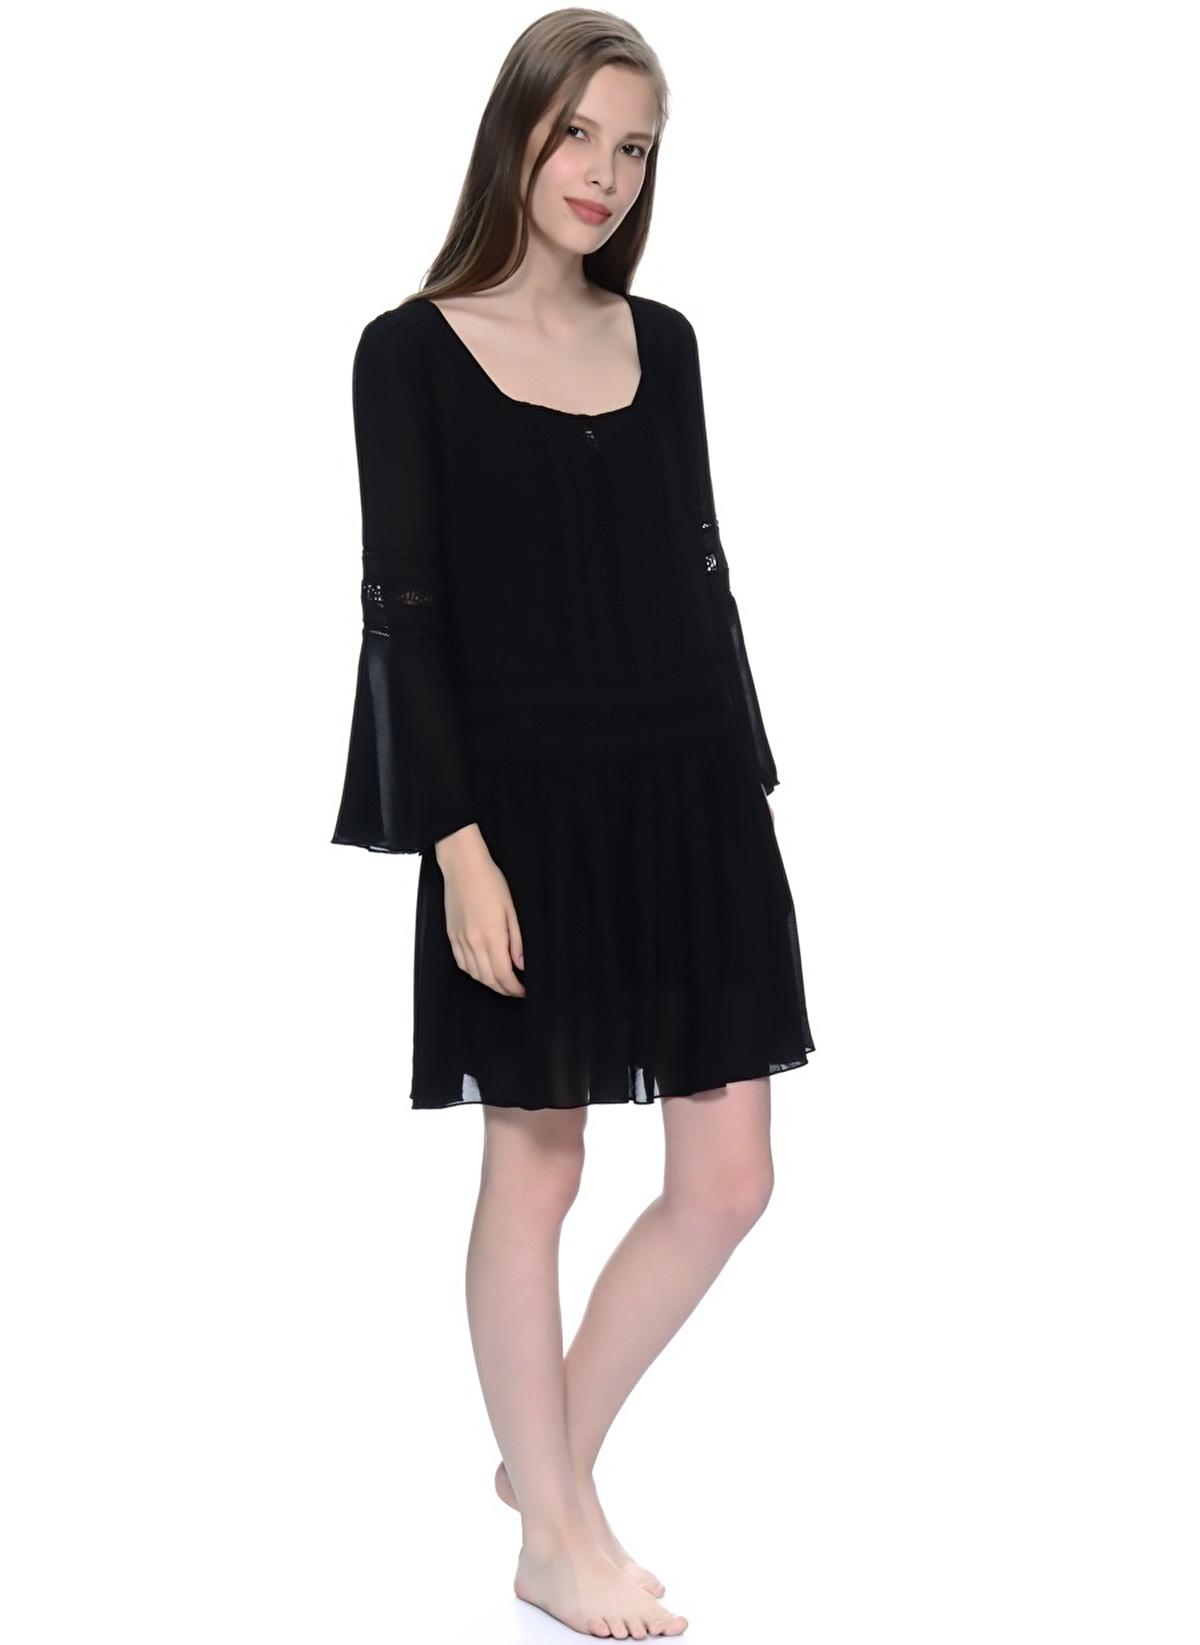 Freemınds Elbise Bıgarade Dress – 94.99 TL